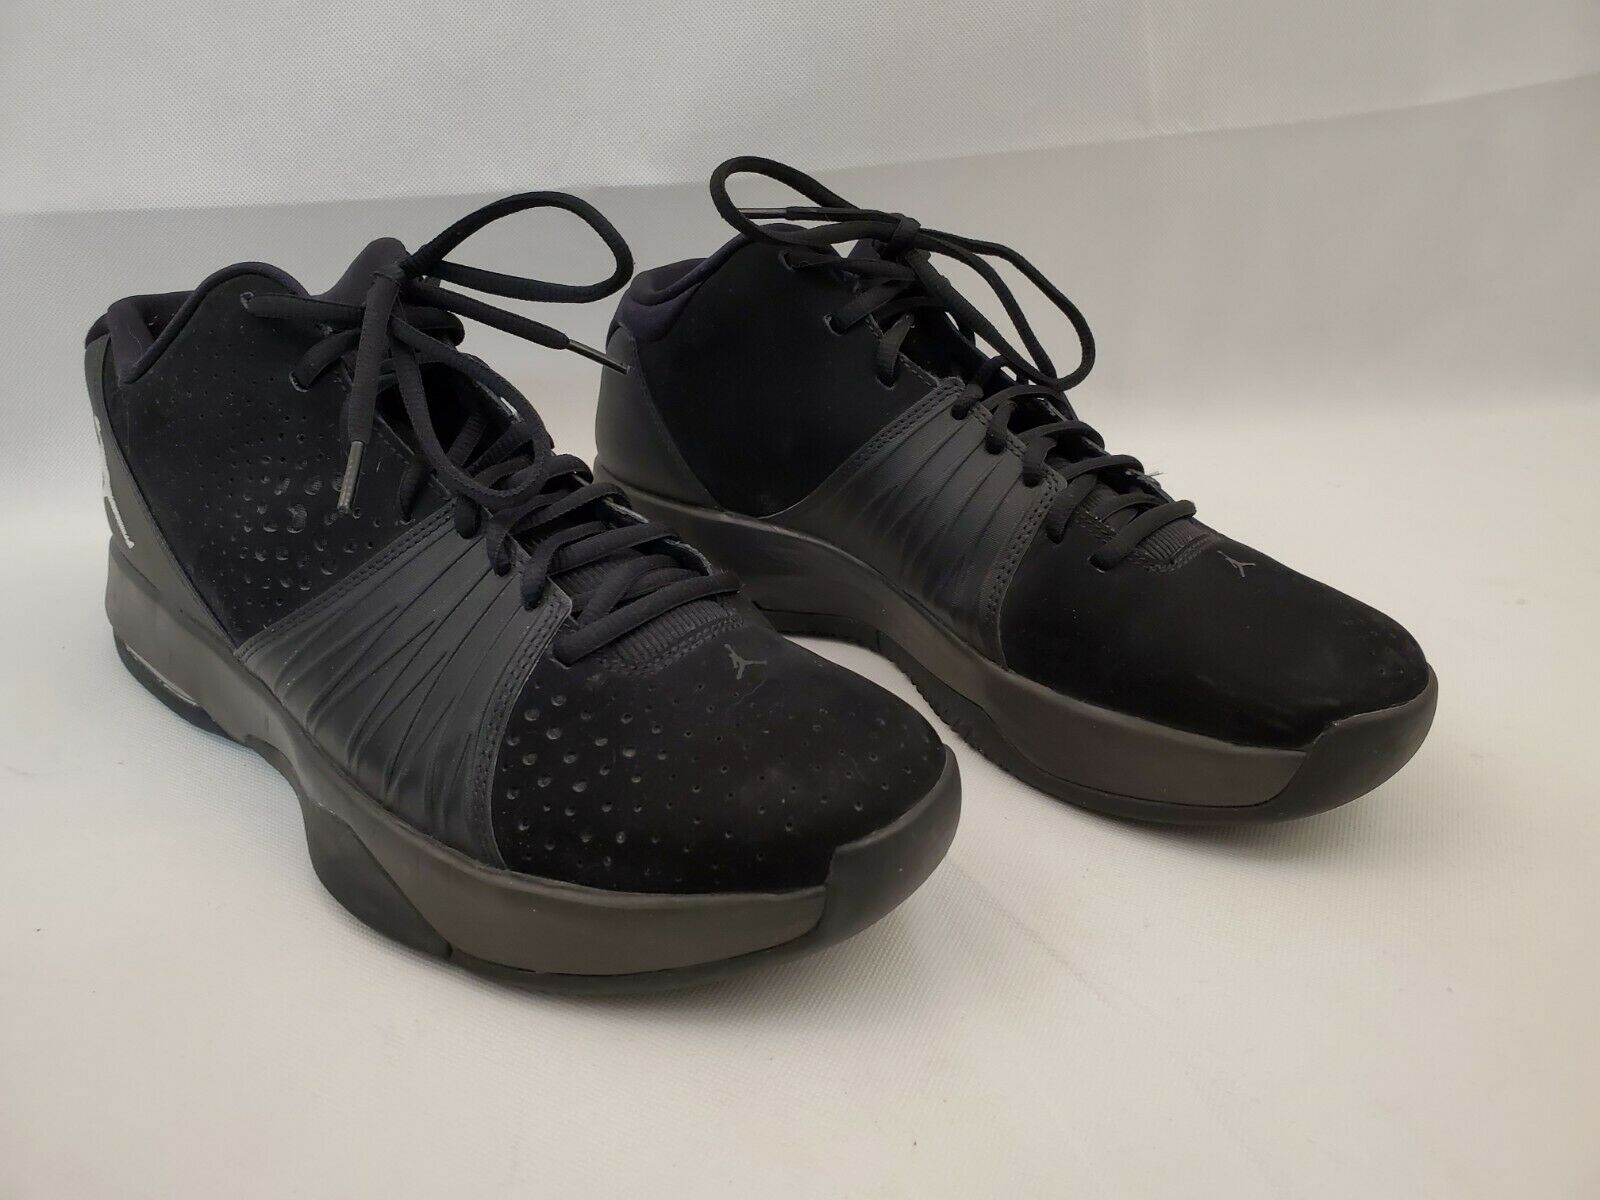 NIKE Air Jordan 5 AM Men Size 13 Black